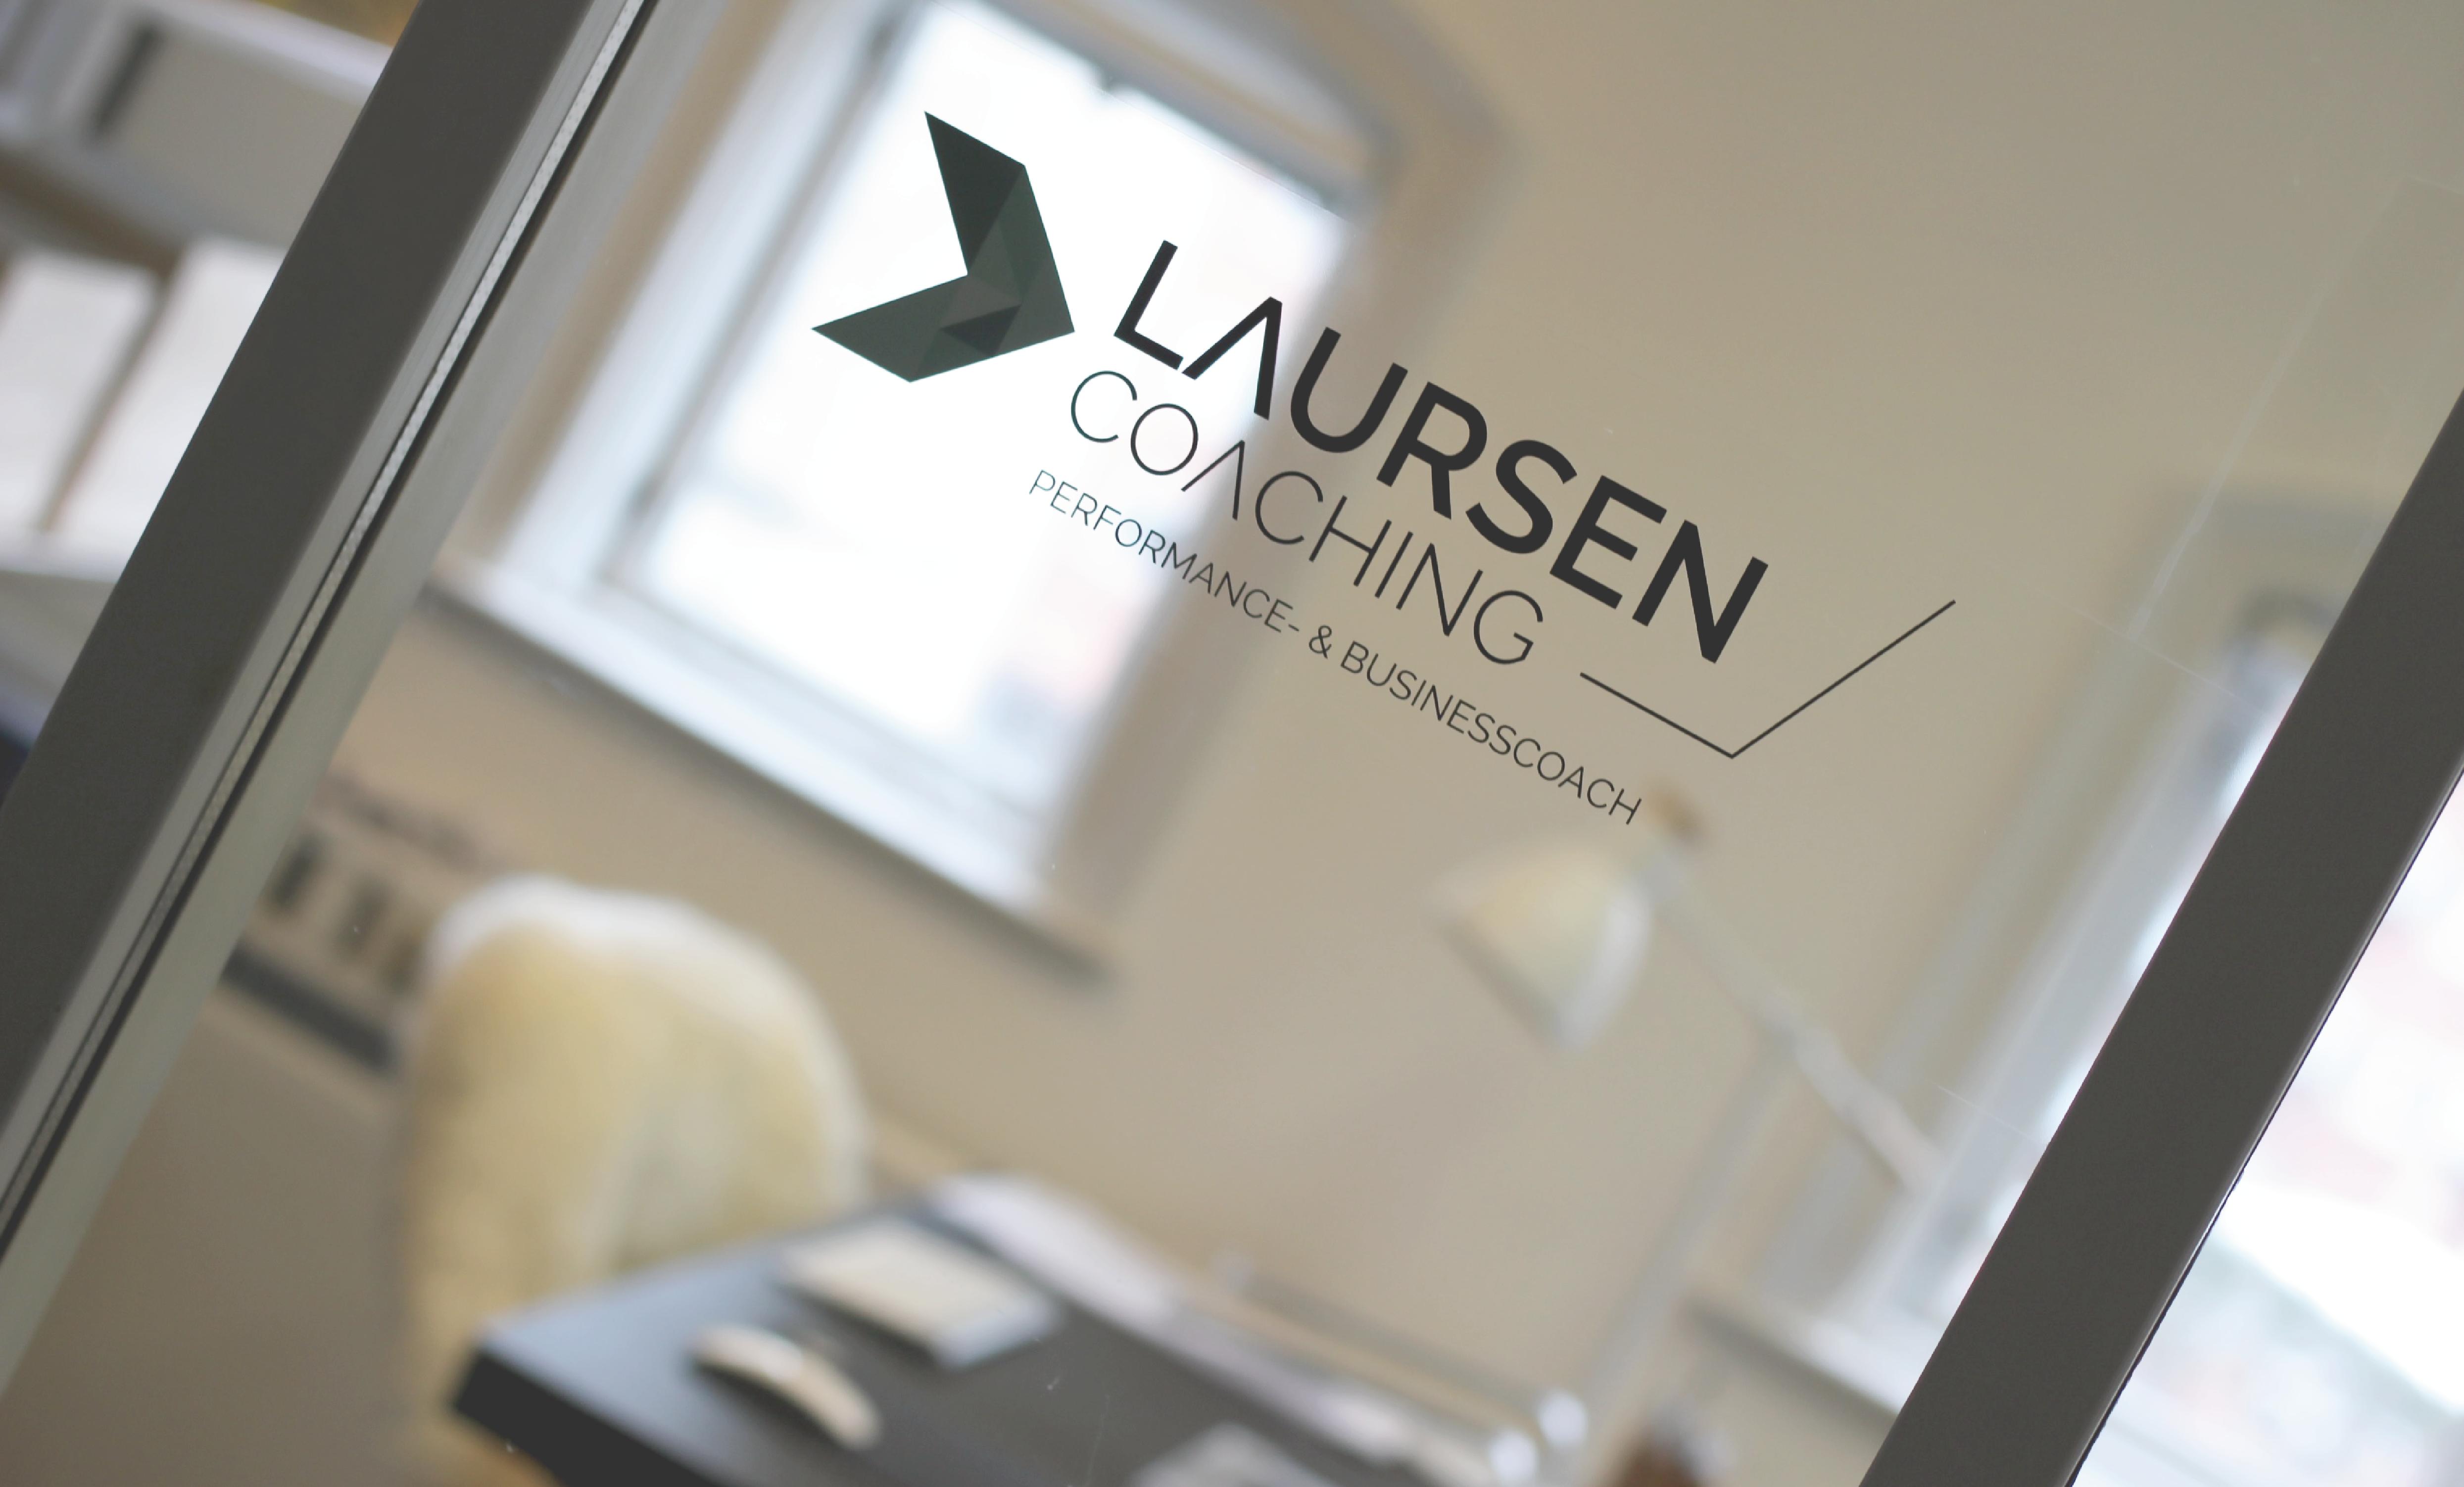 laursen coaching, logo, webdesign, visitkort, visuel identitet, krims, grafisk design, aarhus, maria refsgaard